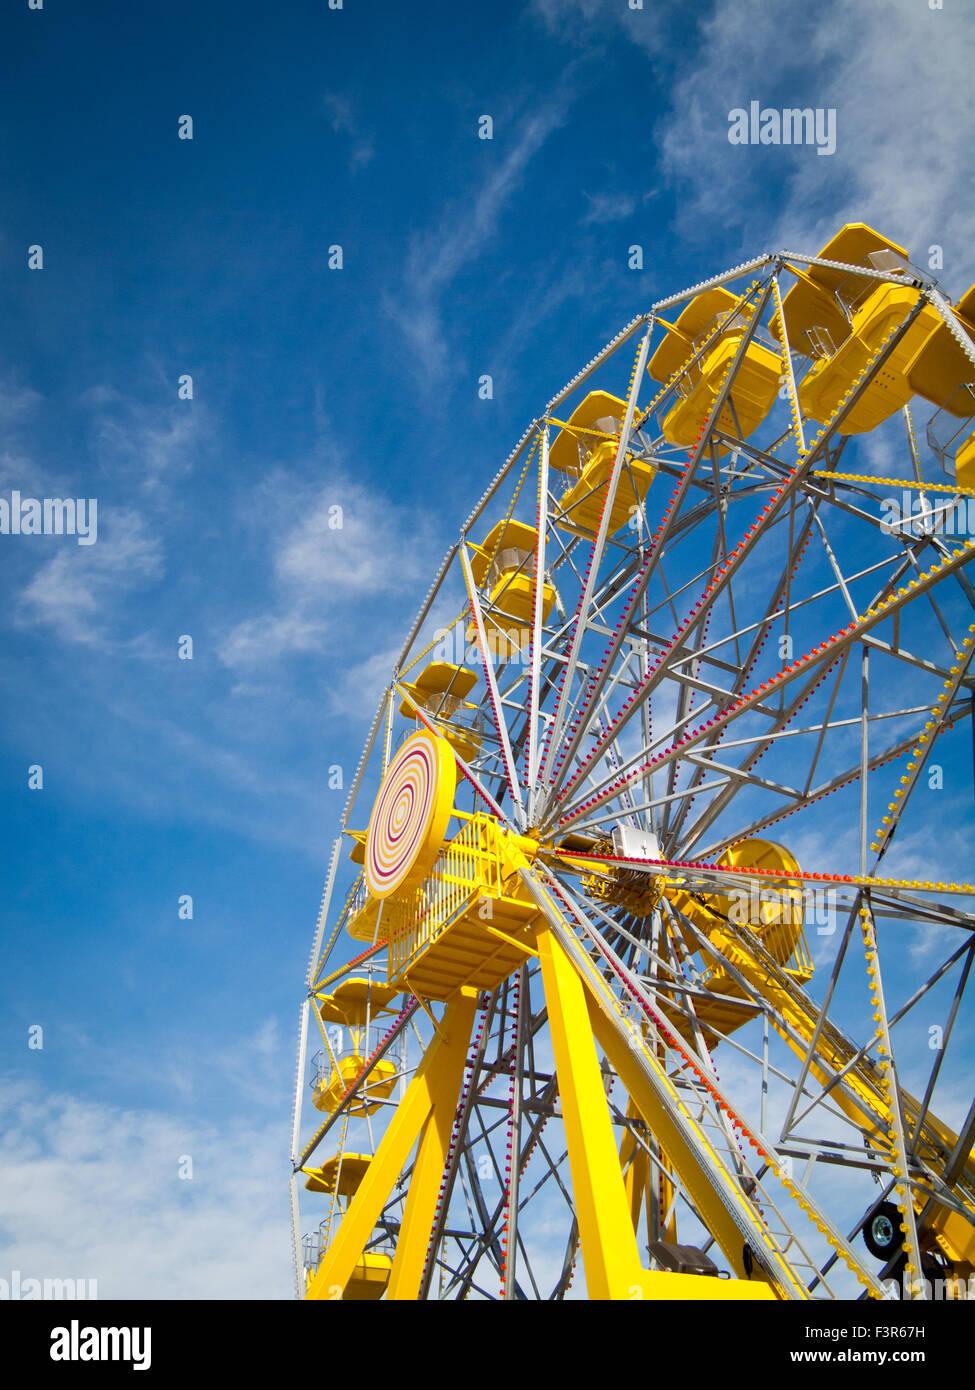 The yellow ferris wheel at the PotashCorp Playland at Kinsmen Park in Saskatoon, Saskatchewan, Canada. Stock Photo